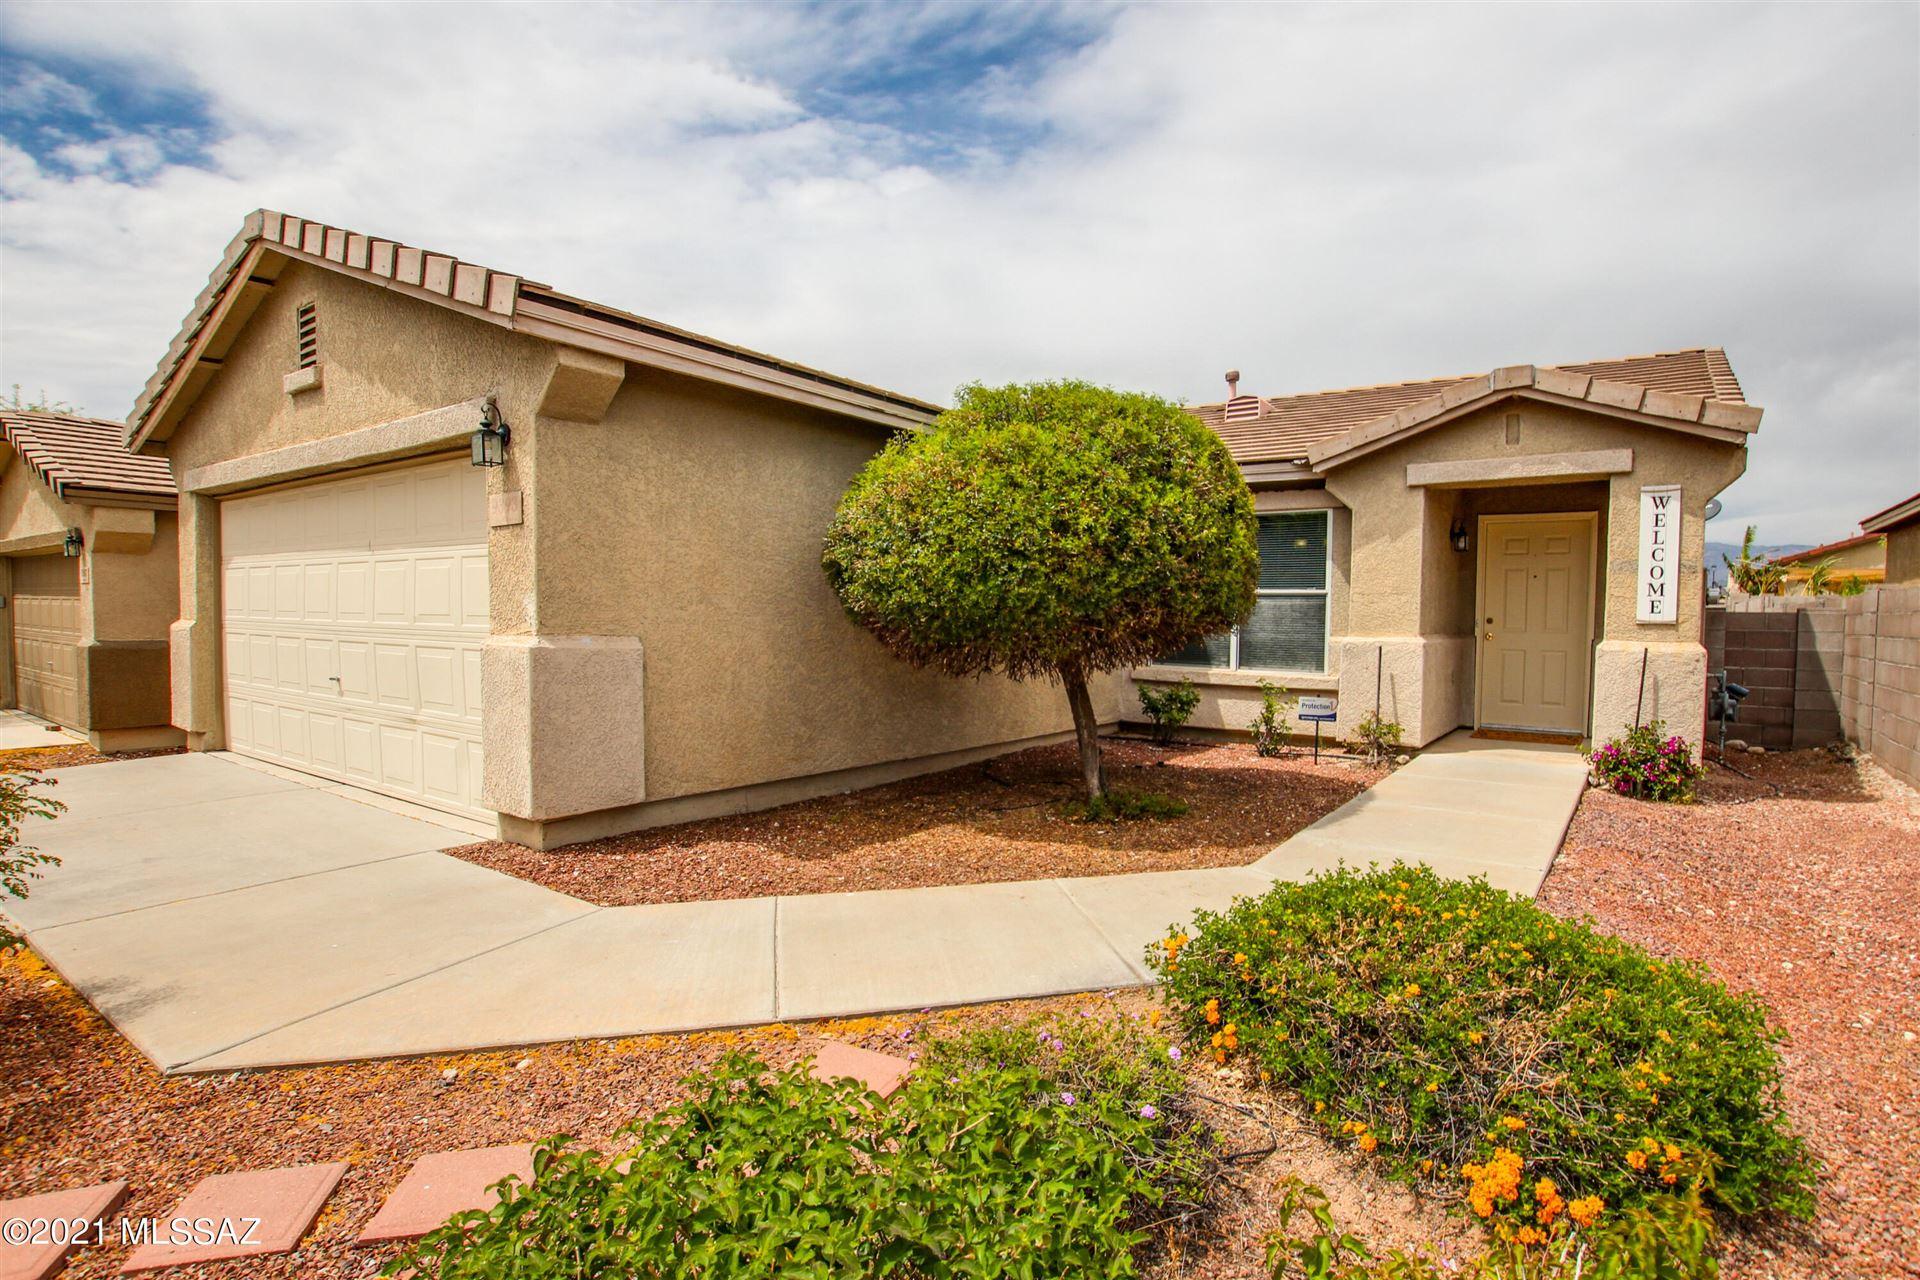 9393 E Rockhouse Peak Place, Tucson, AZ 85710 - MLS#: 22109944